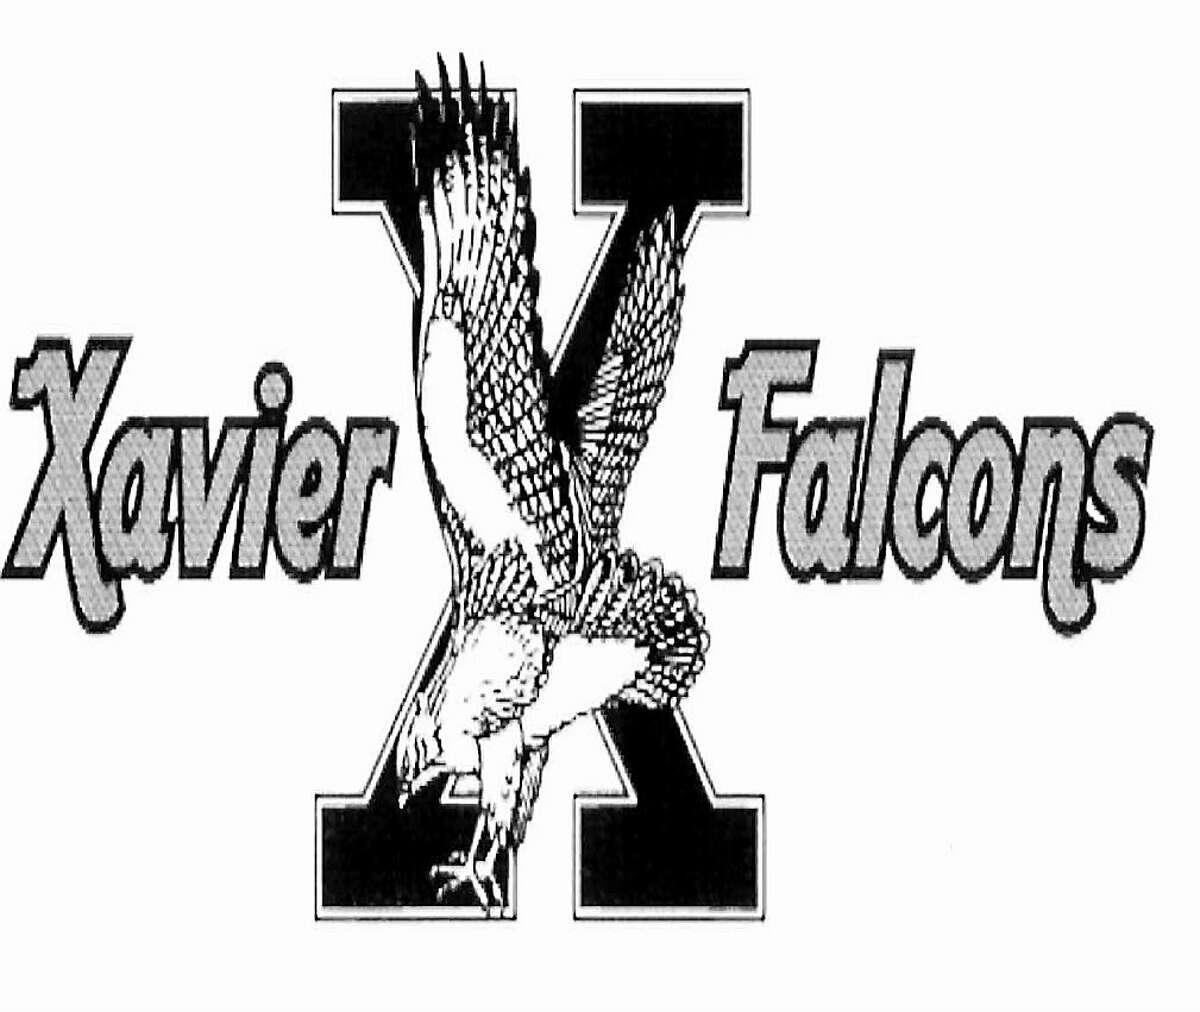 Xavier High School in Middletown.